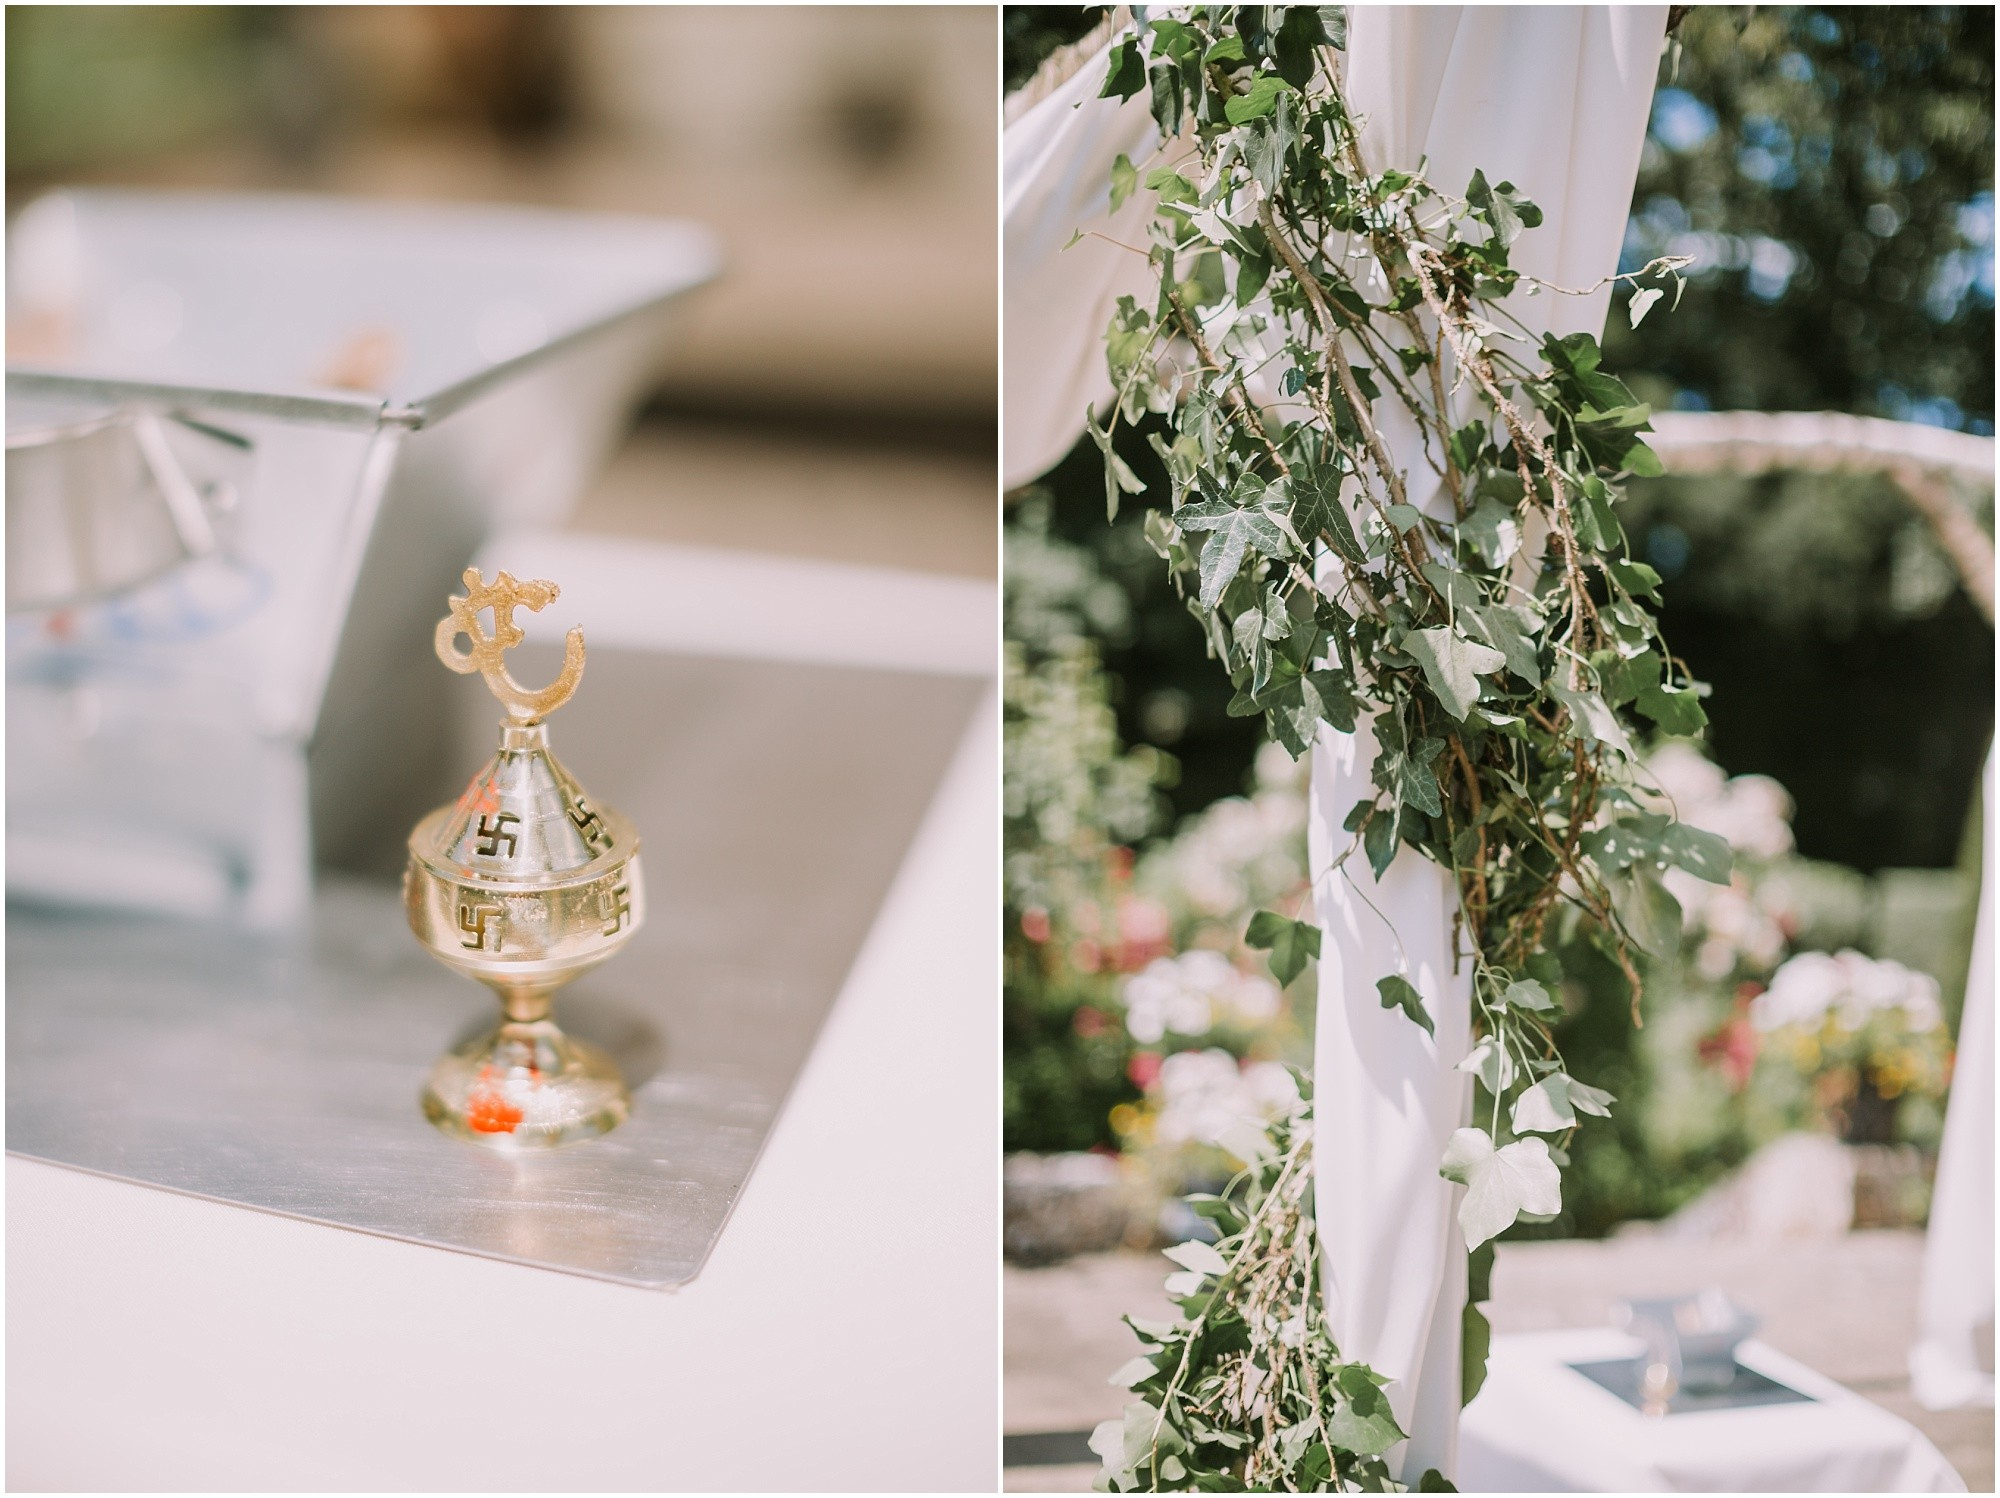 Kateryna-photos-photographer-mariage-chateau-saint-paterne-alencon-normandie-mayenne-le-mans_0054.jpg